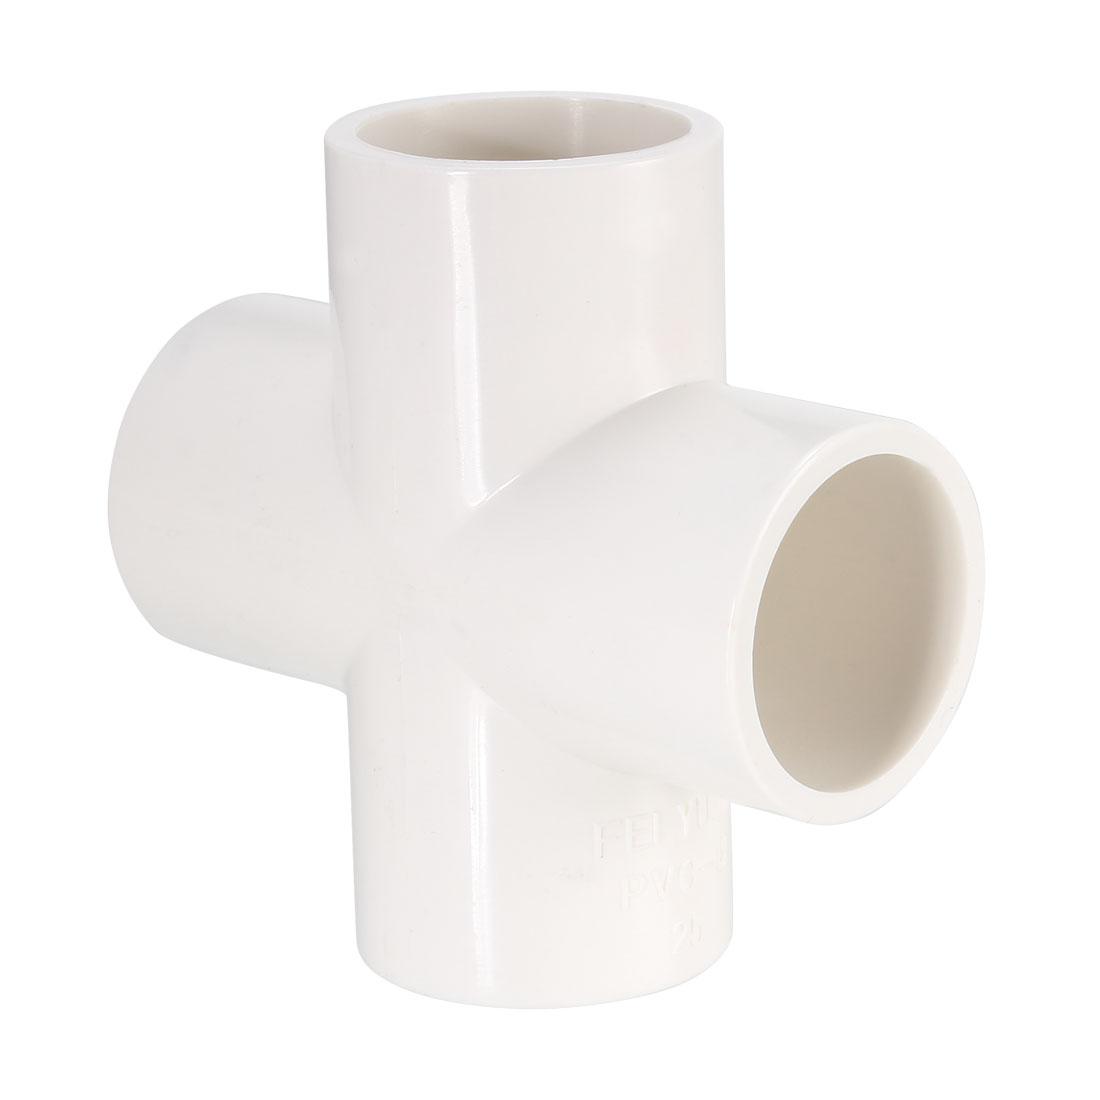 PVC Pipe Fitting, 4 Way Cross, 25mm Socket, PVC Furniture Fittings White